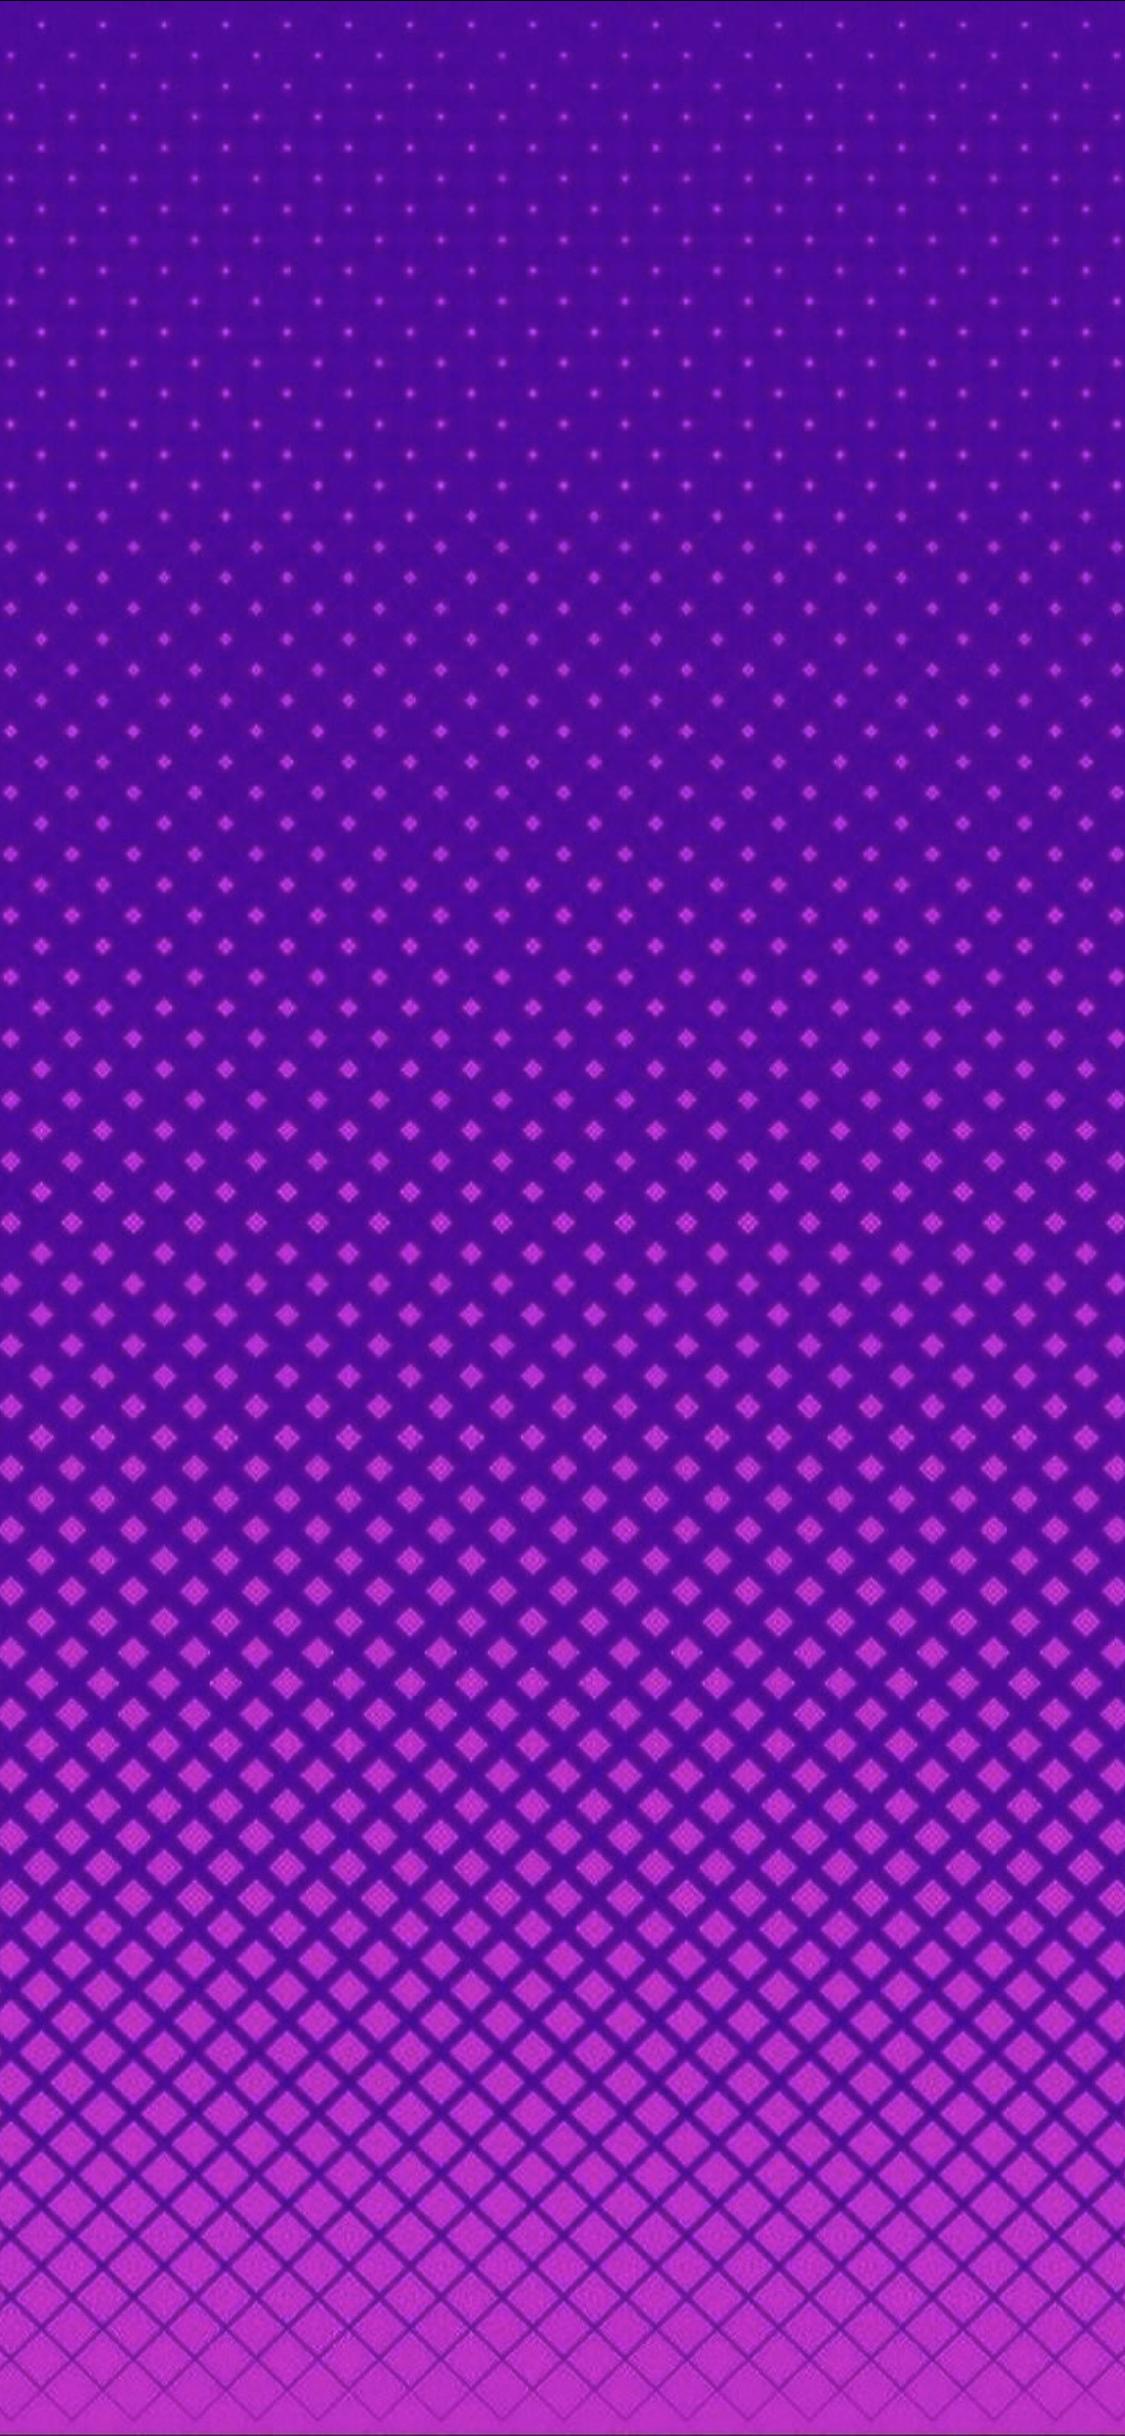 Wallpaper Iphone X Chevron Wallpaper Purple Wallpaper Textures Patterns